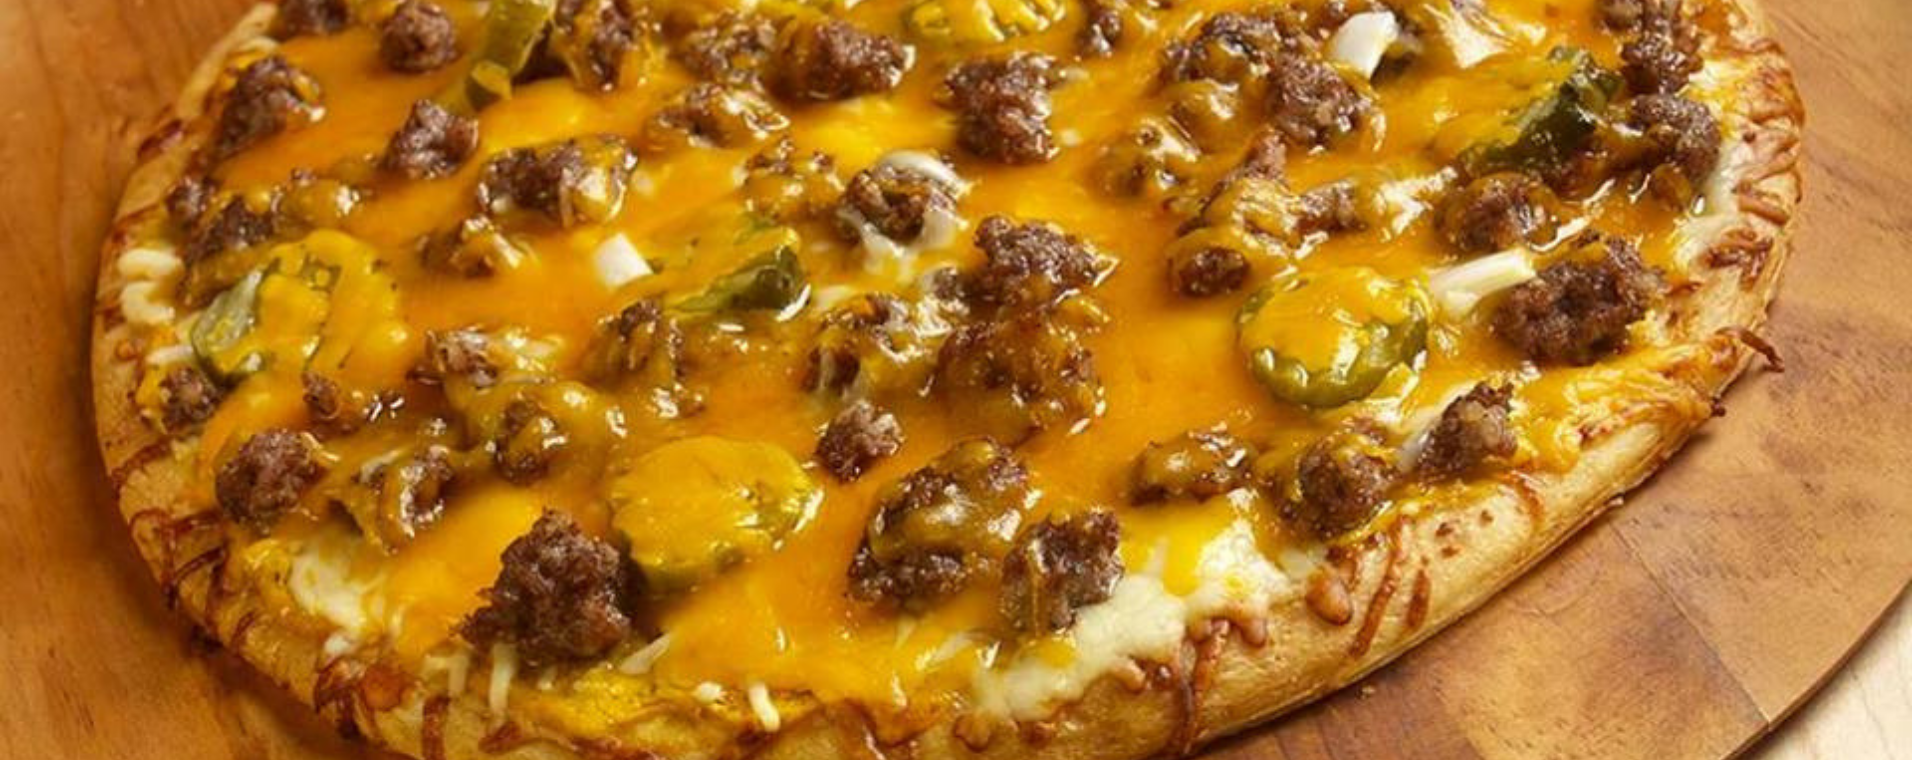 Bg desktop papa ray's pizza